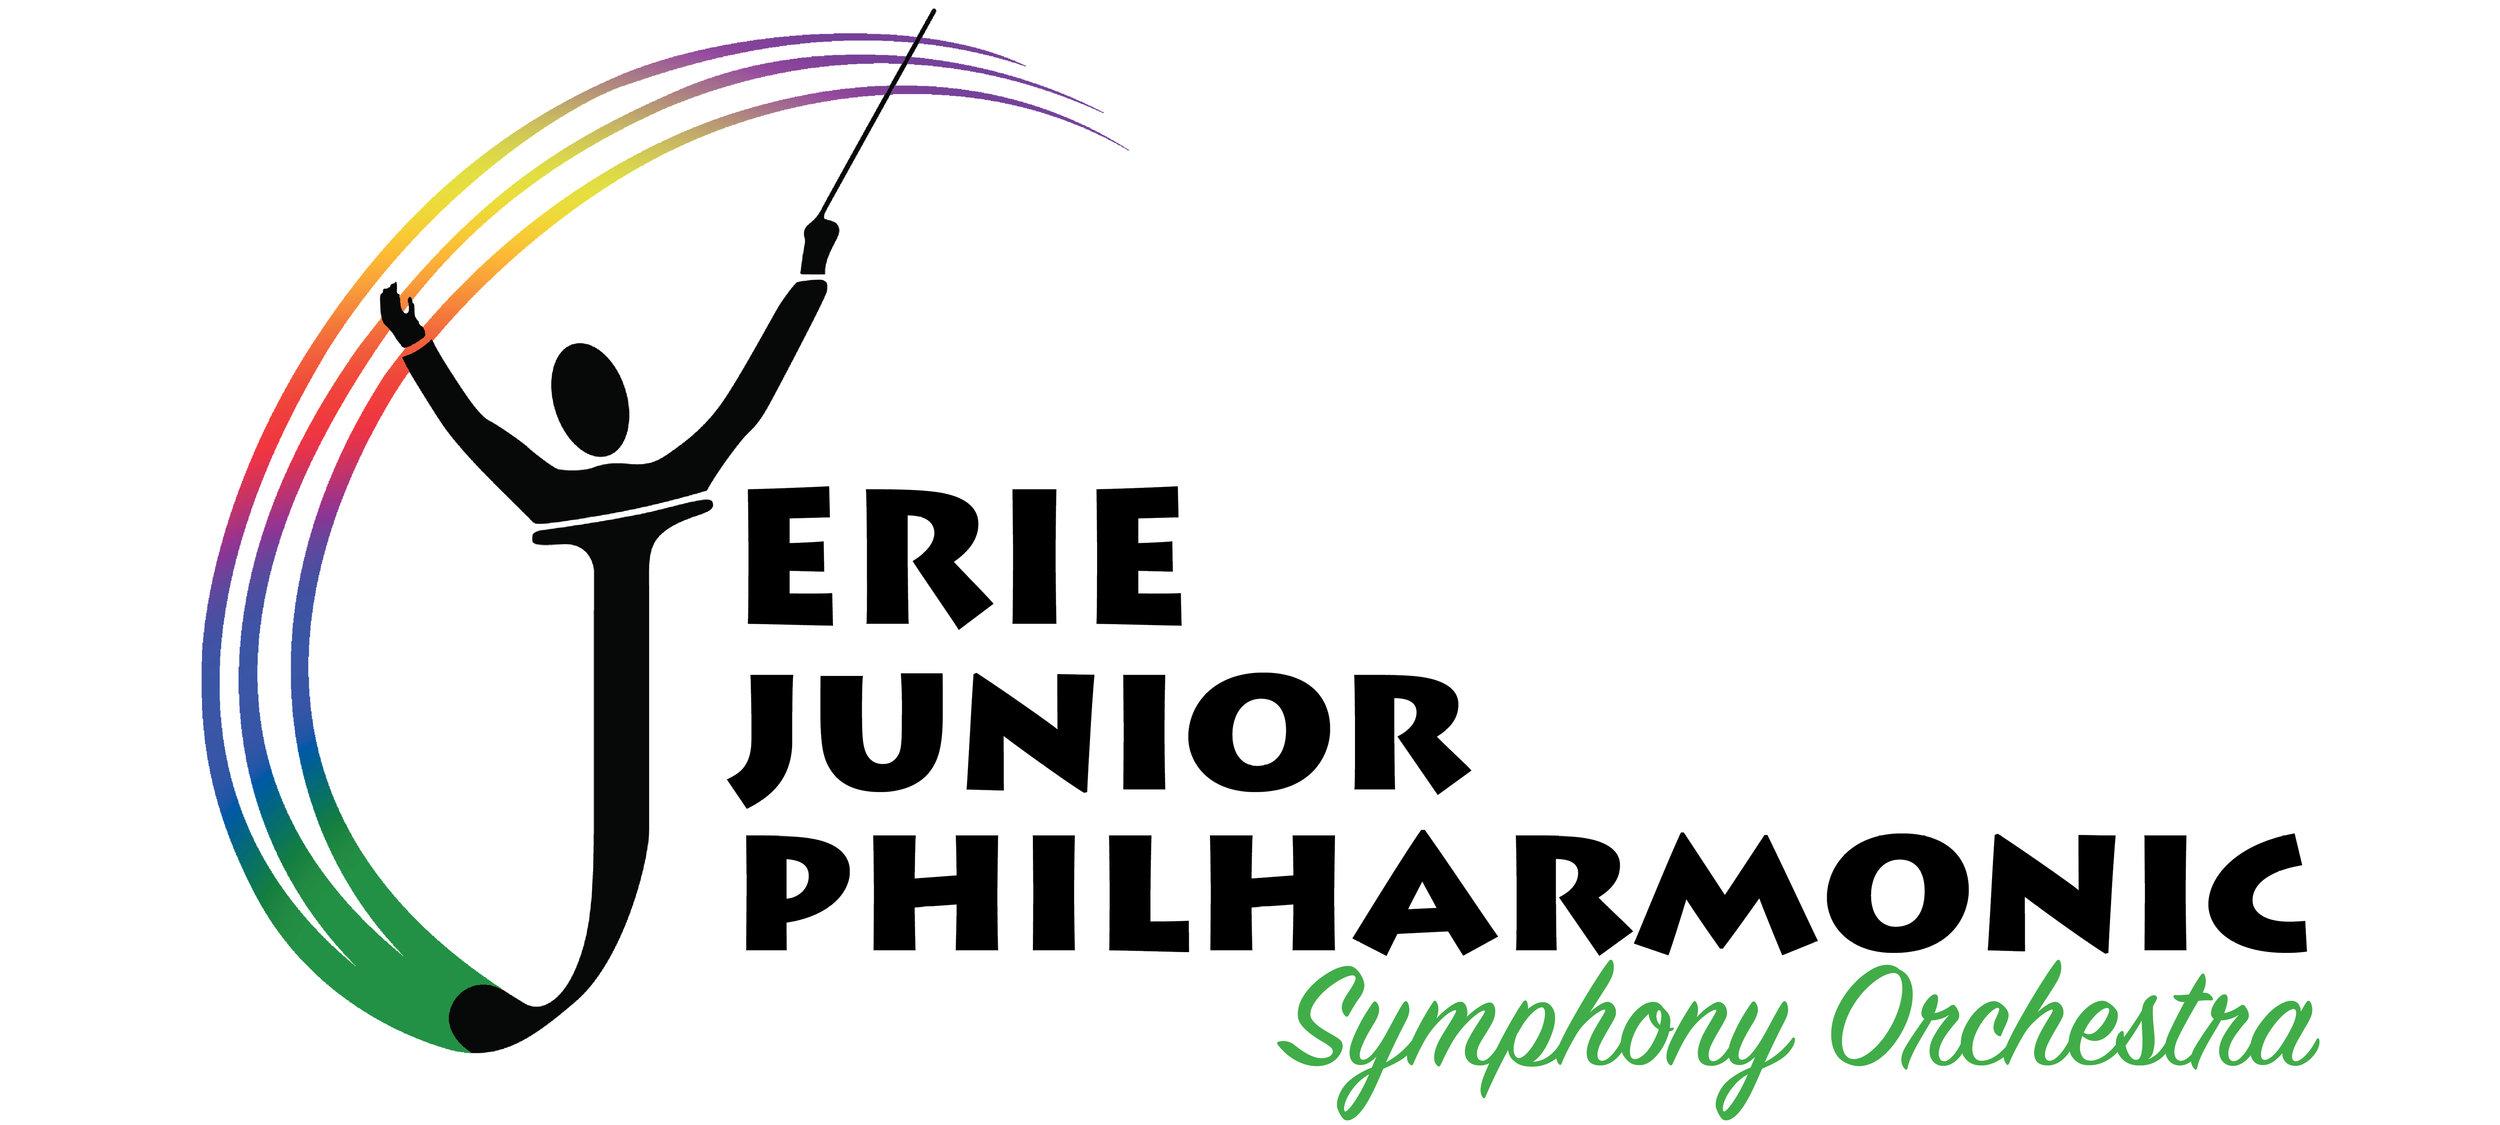 Jr. Phil Symphony Orchestra LOGO.jpg